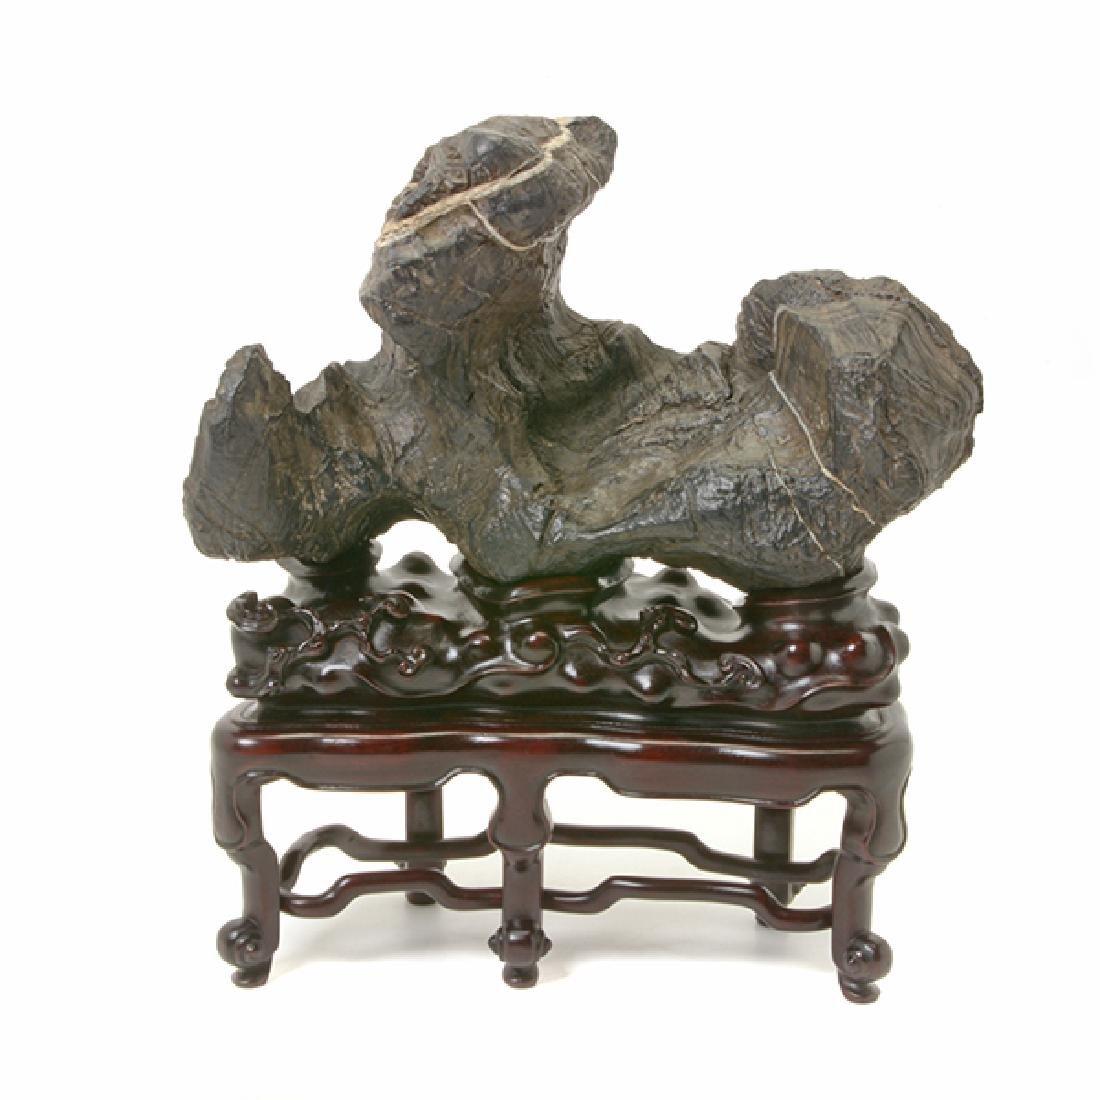 An Unusal Lingbi Scholar's Rock